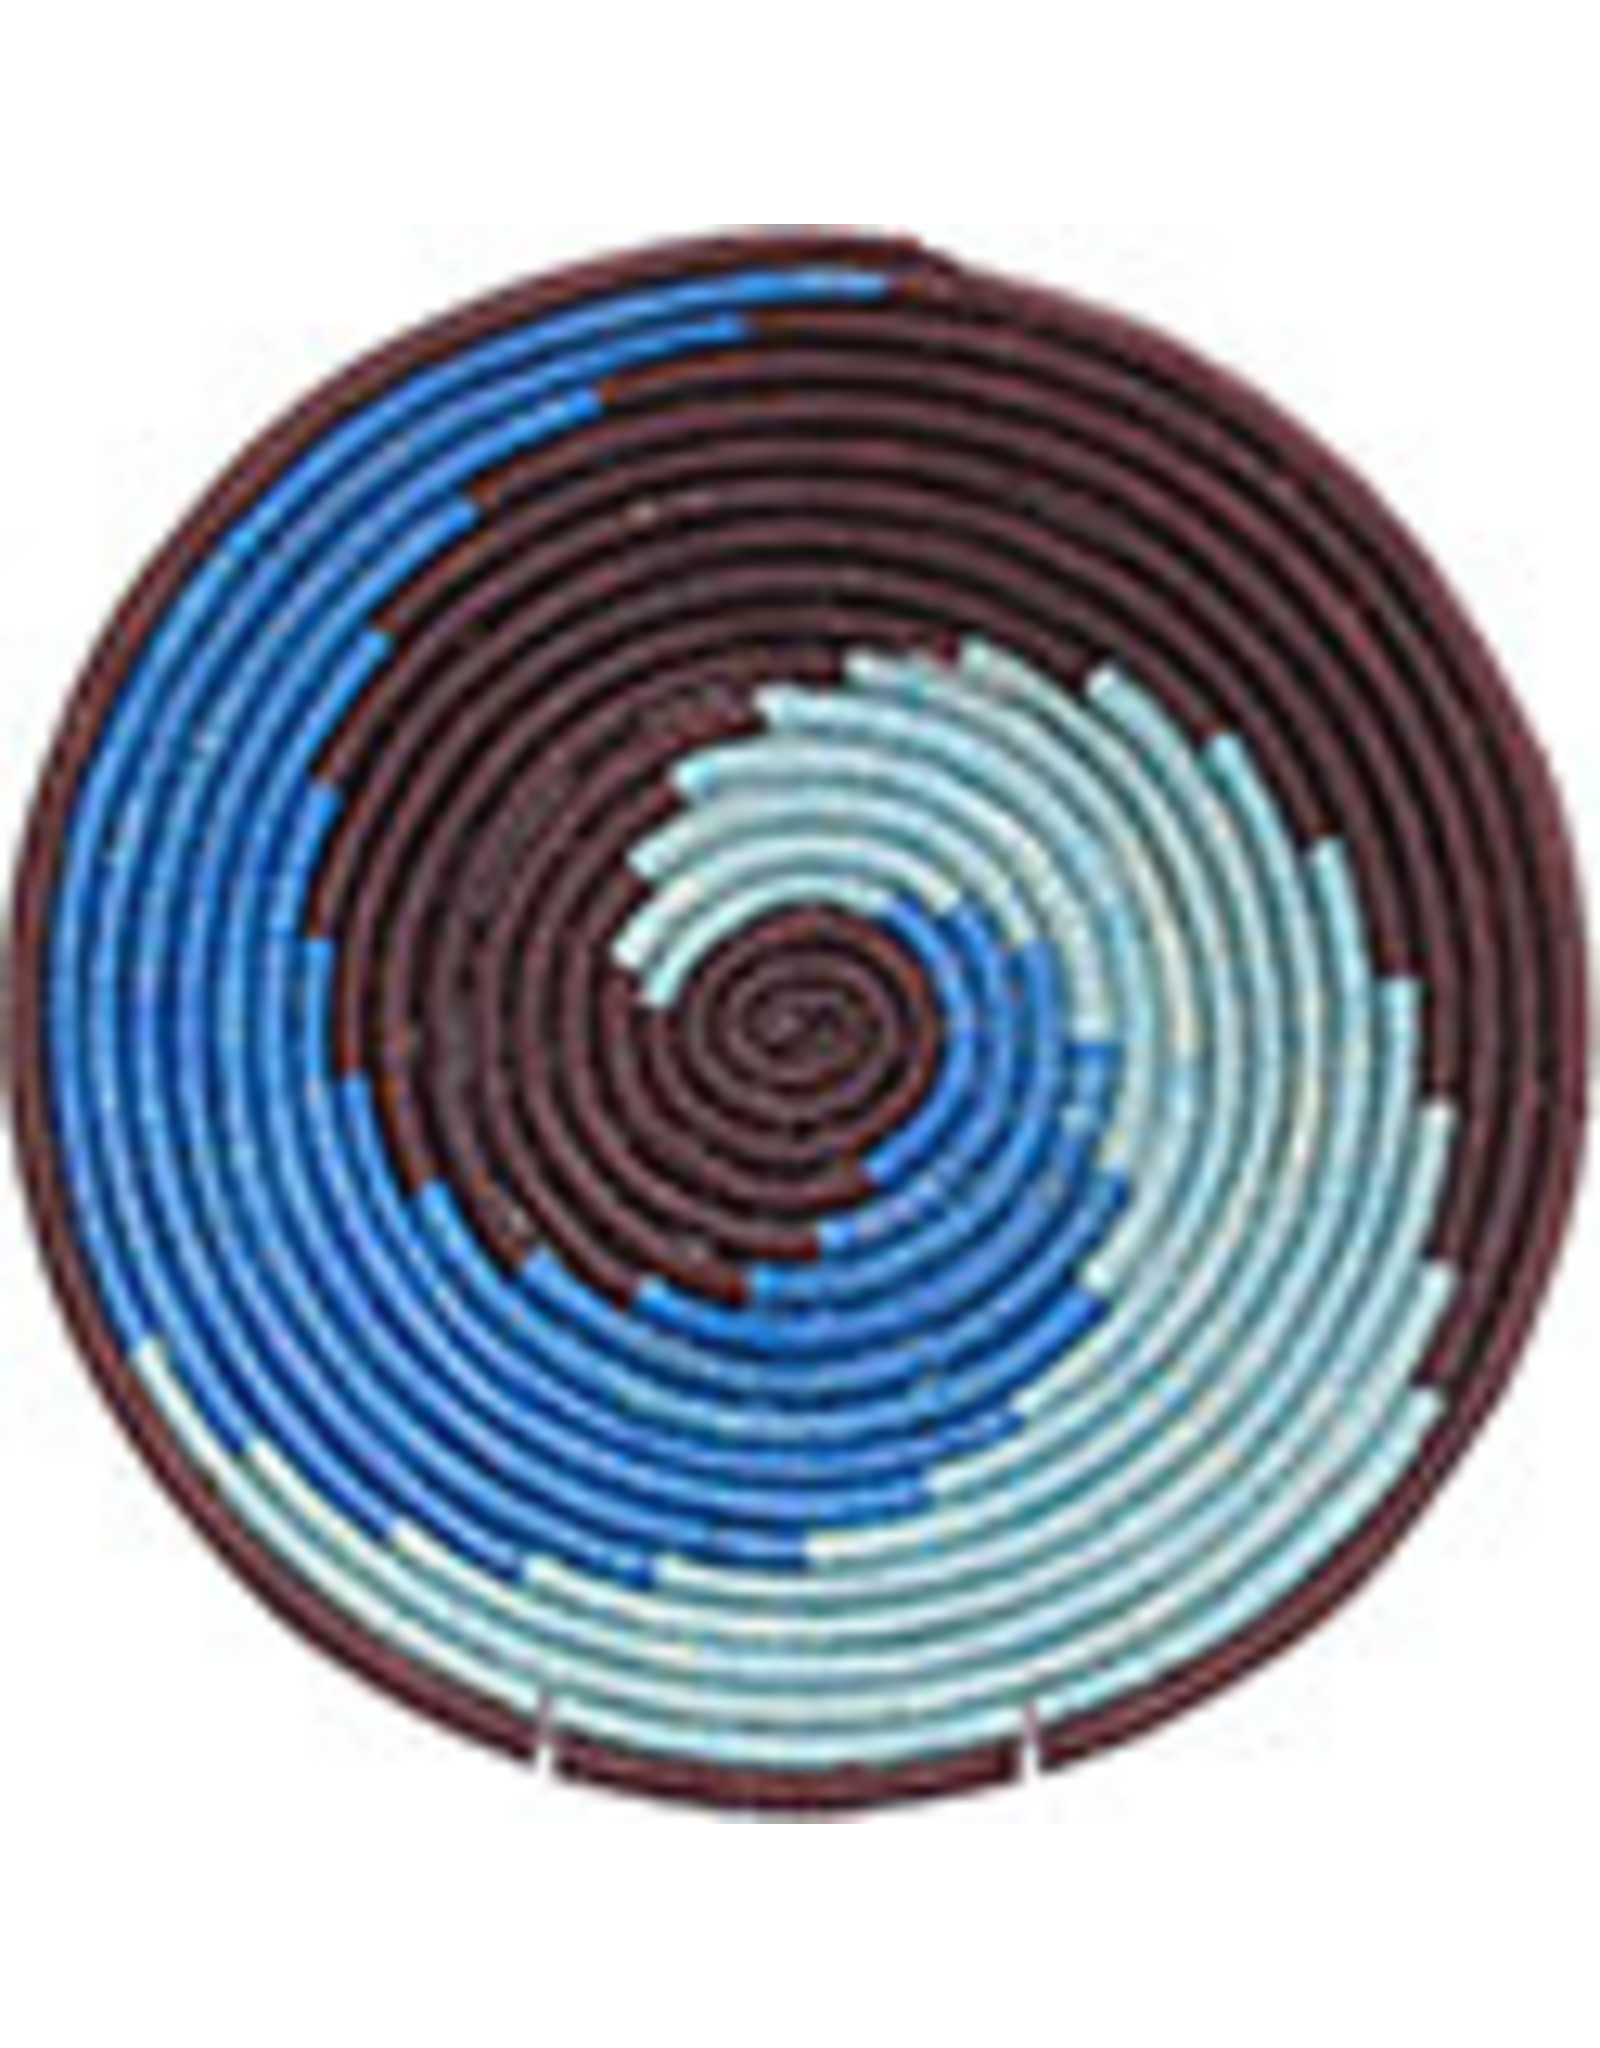 "Bukedo and Raffia Basket, Ocean Spiral, 23"", Uganda"